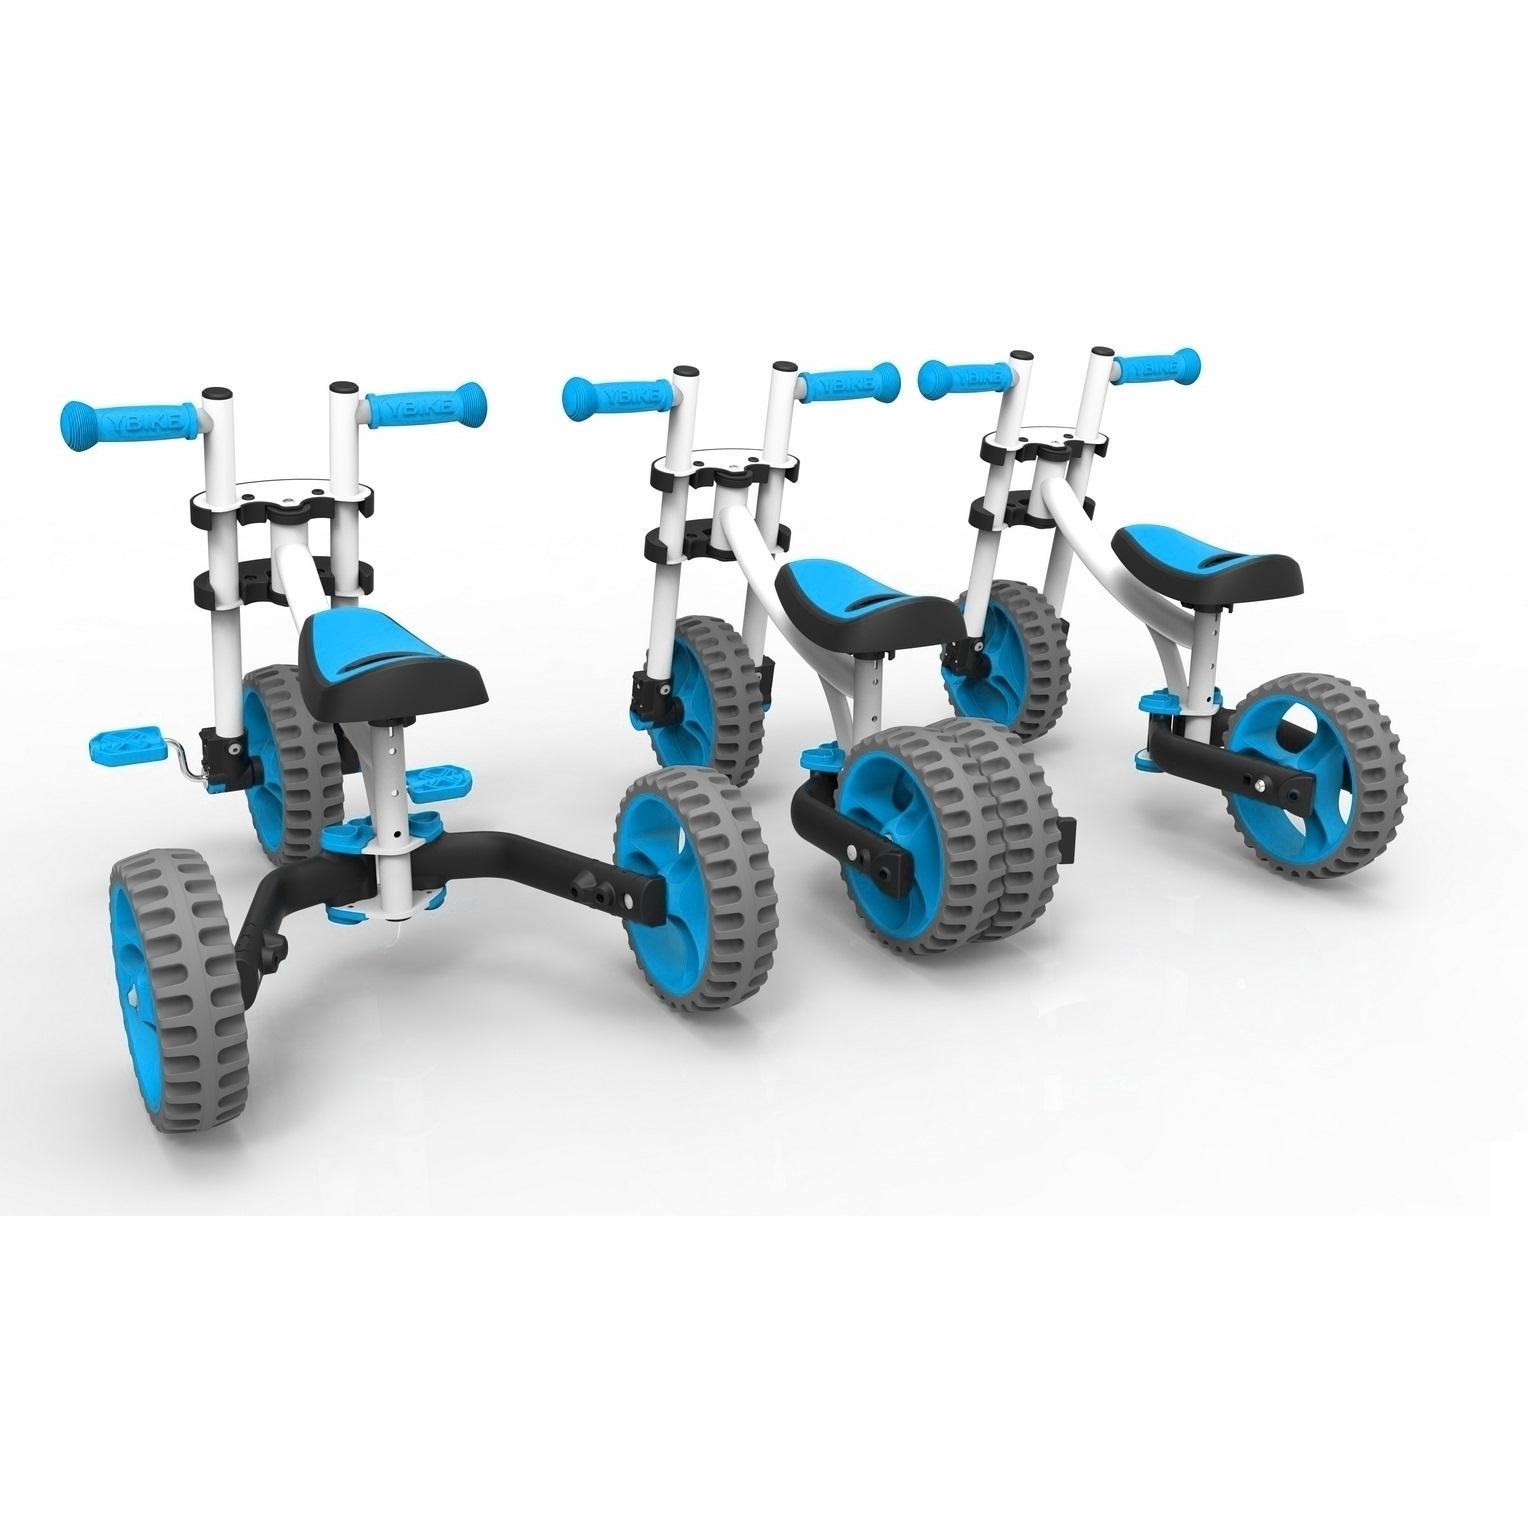 ������������-��������� Y-Bike Evolve Trike White Blue